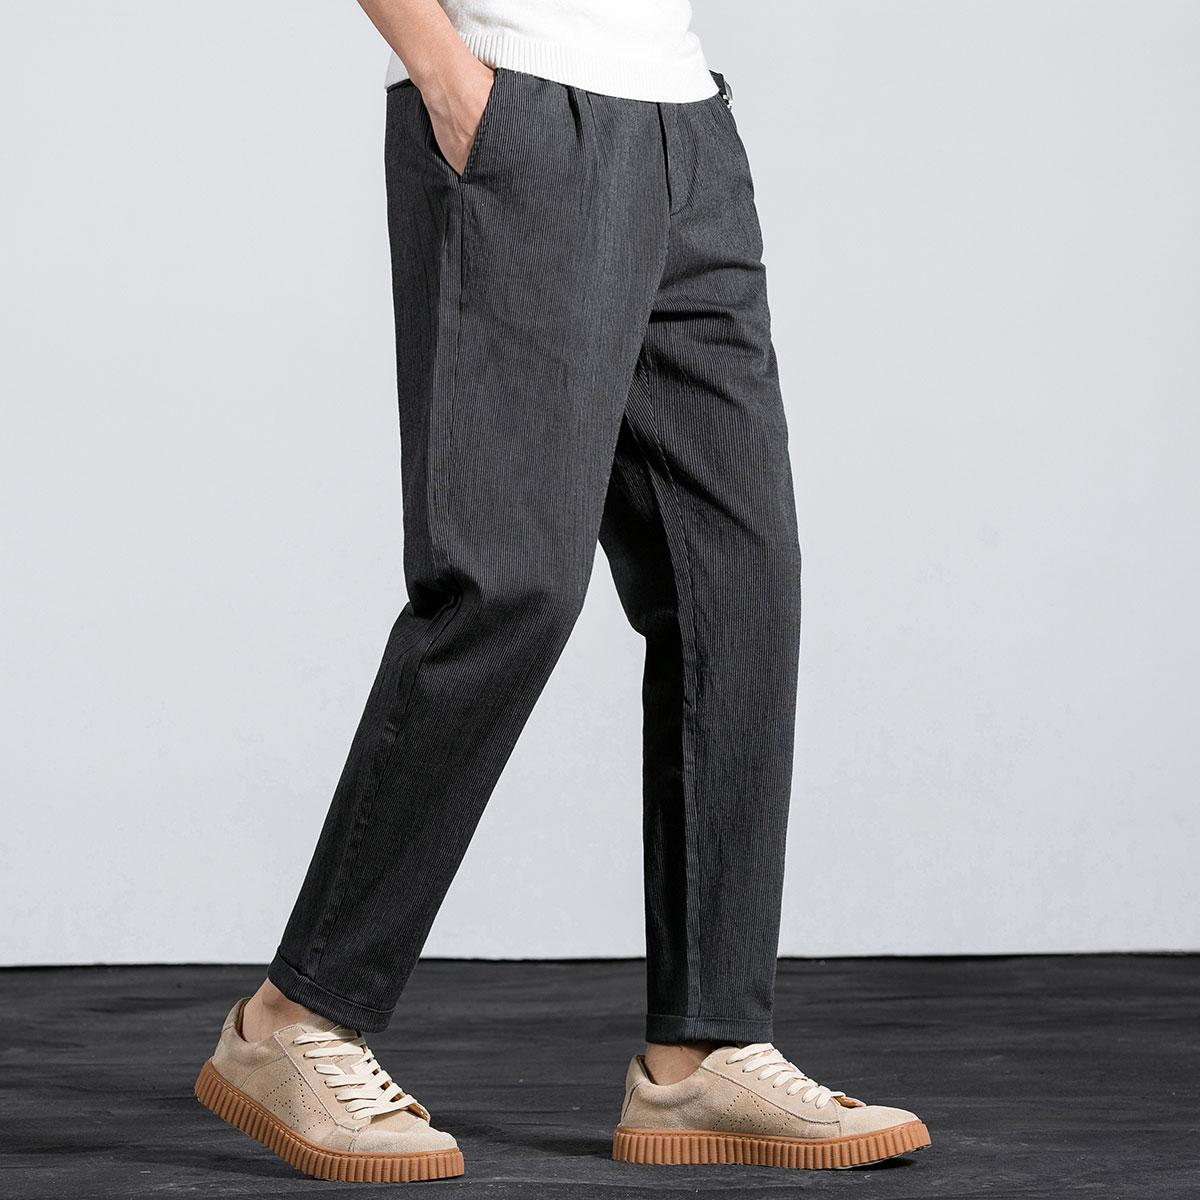 KM KILO KMMETERS2019秋季新款时尚休闲长裤男士休闲裤M1CK200962K8